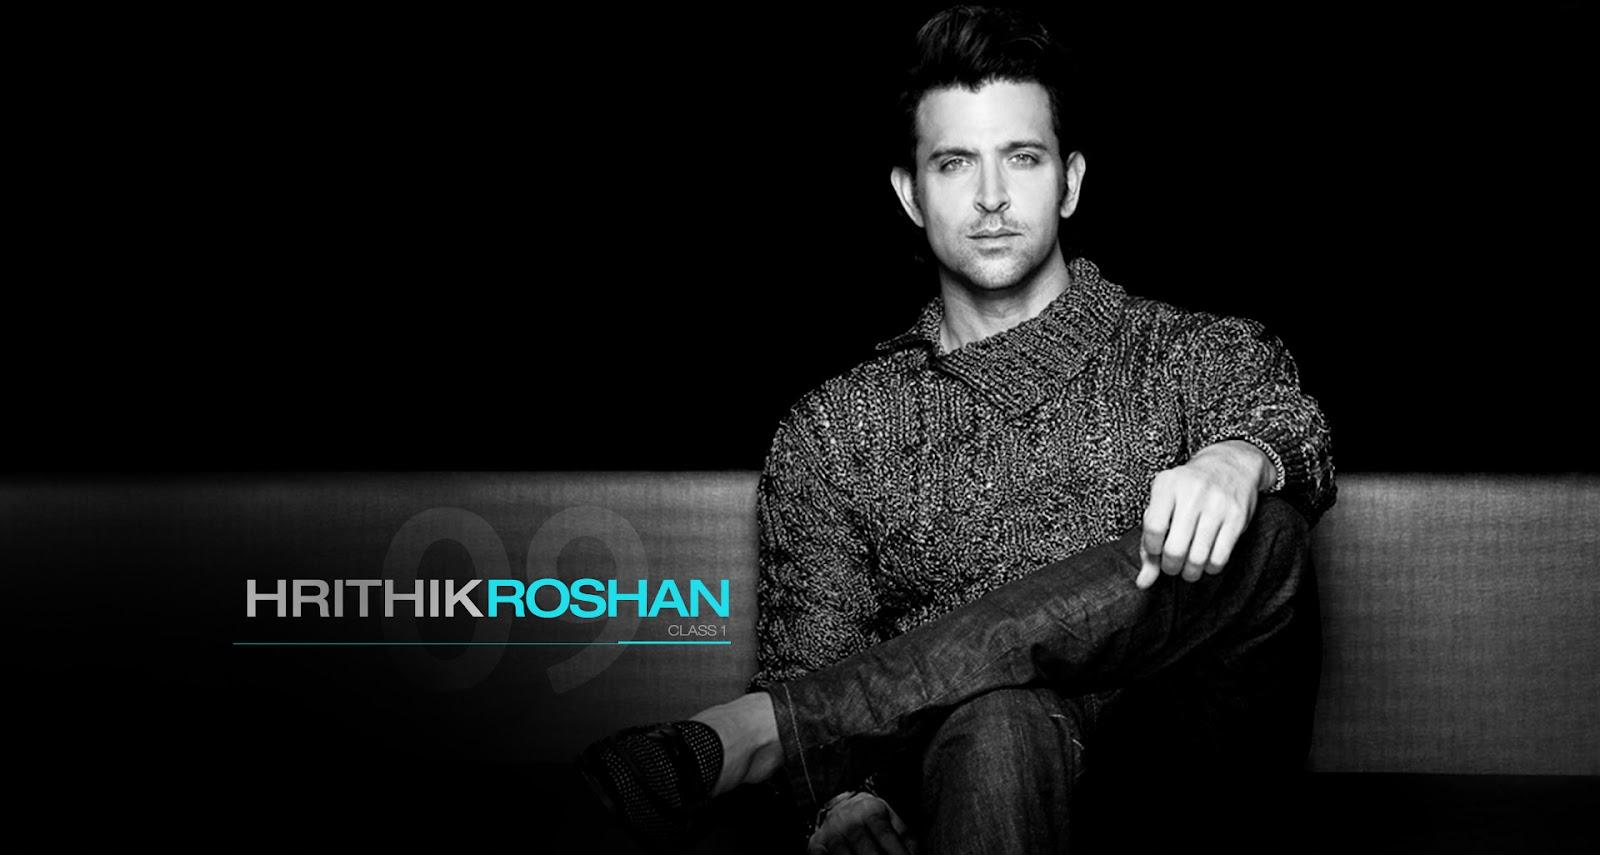 Hrithik Roshan 1080p HD Wallpaper & Images Free Downloads